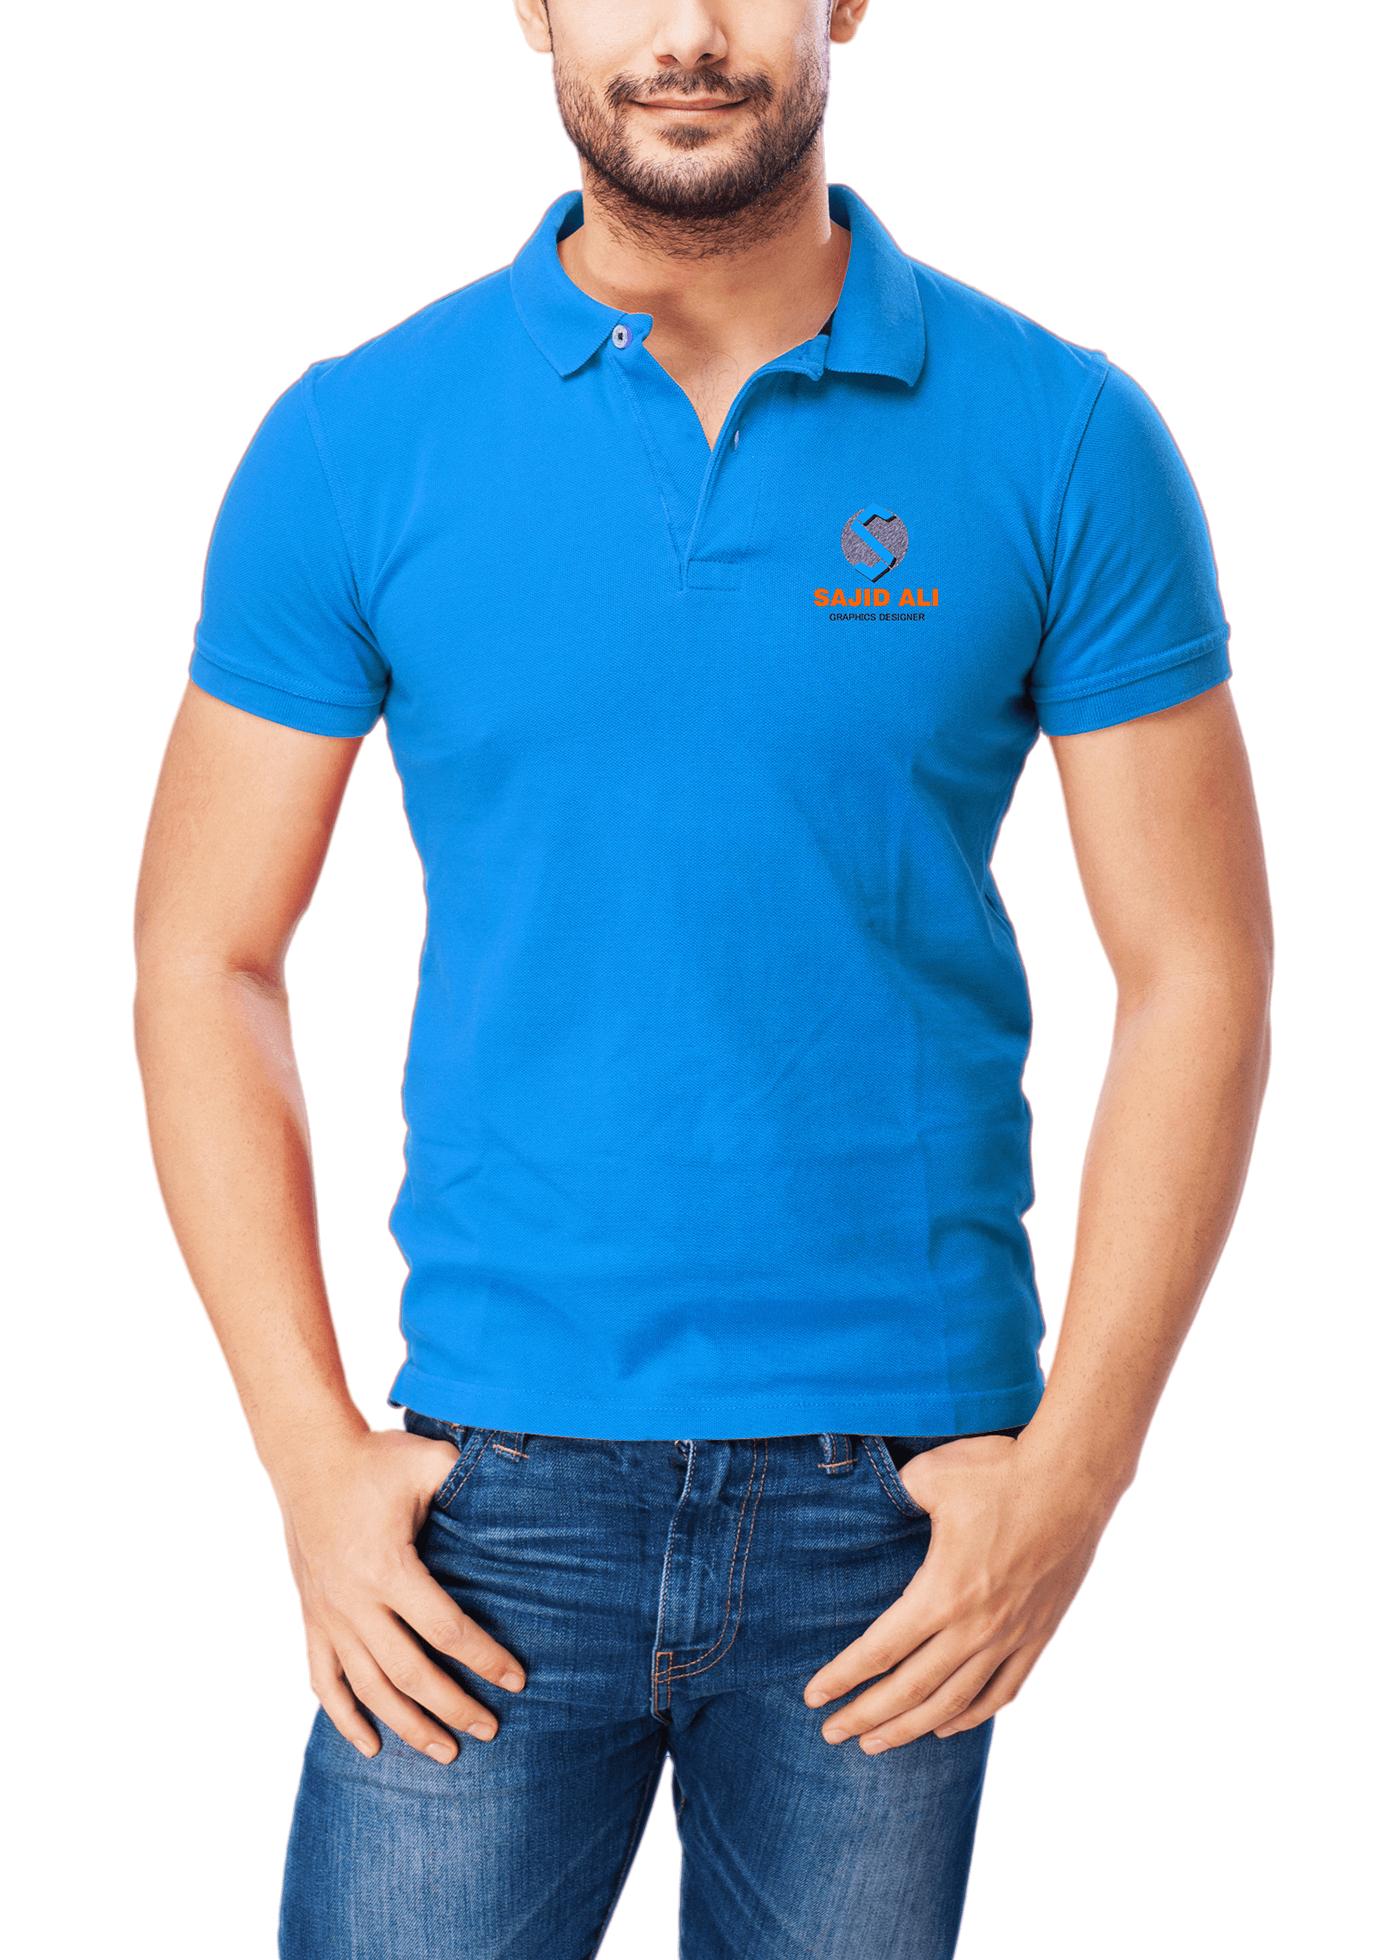 psd мокап футболки поло. set of polo shirt mockups